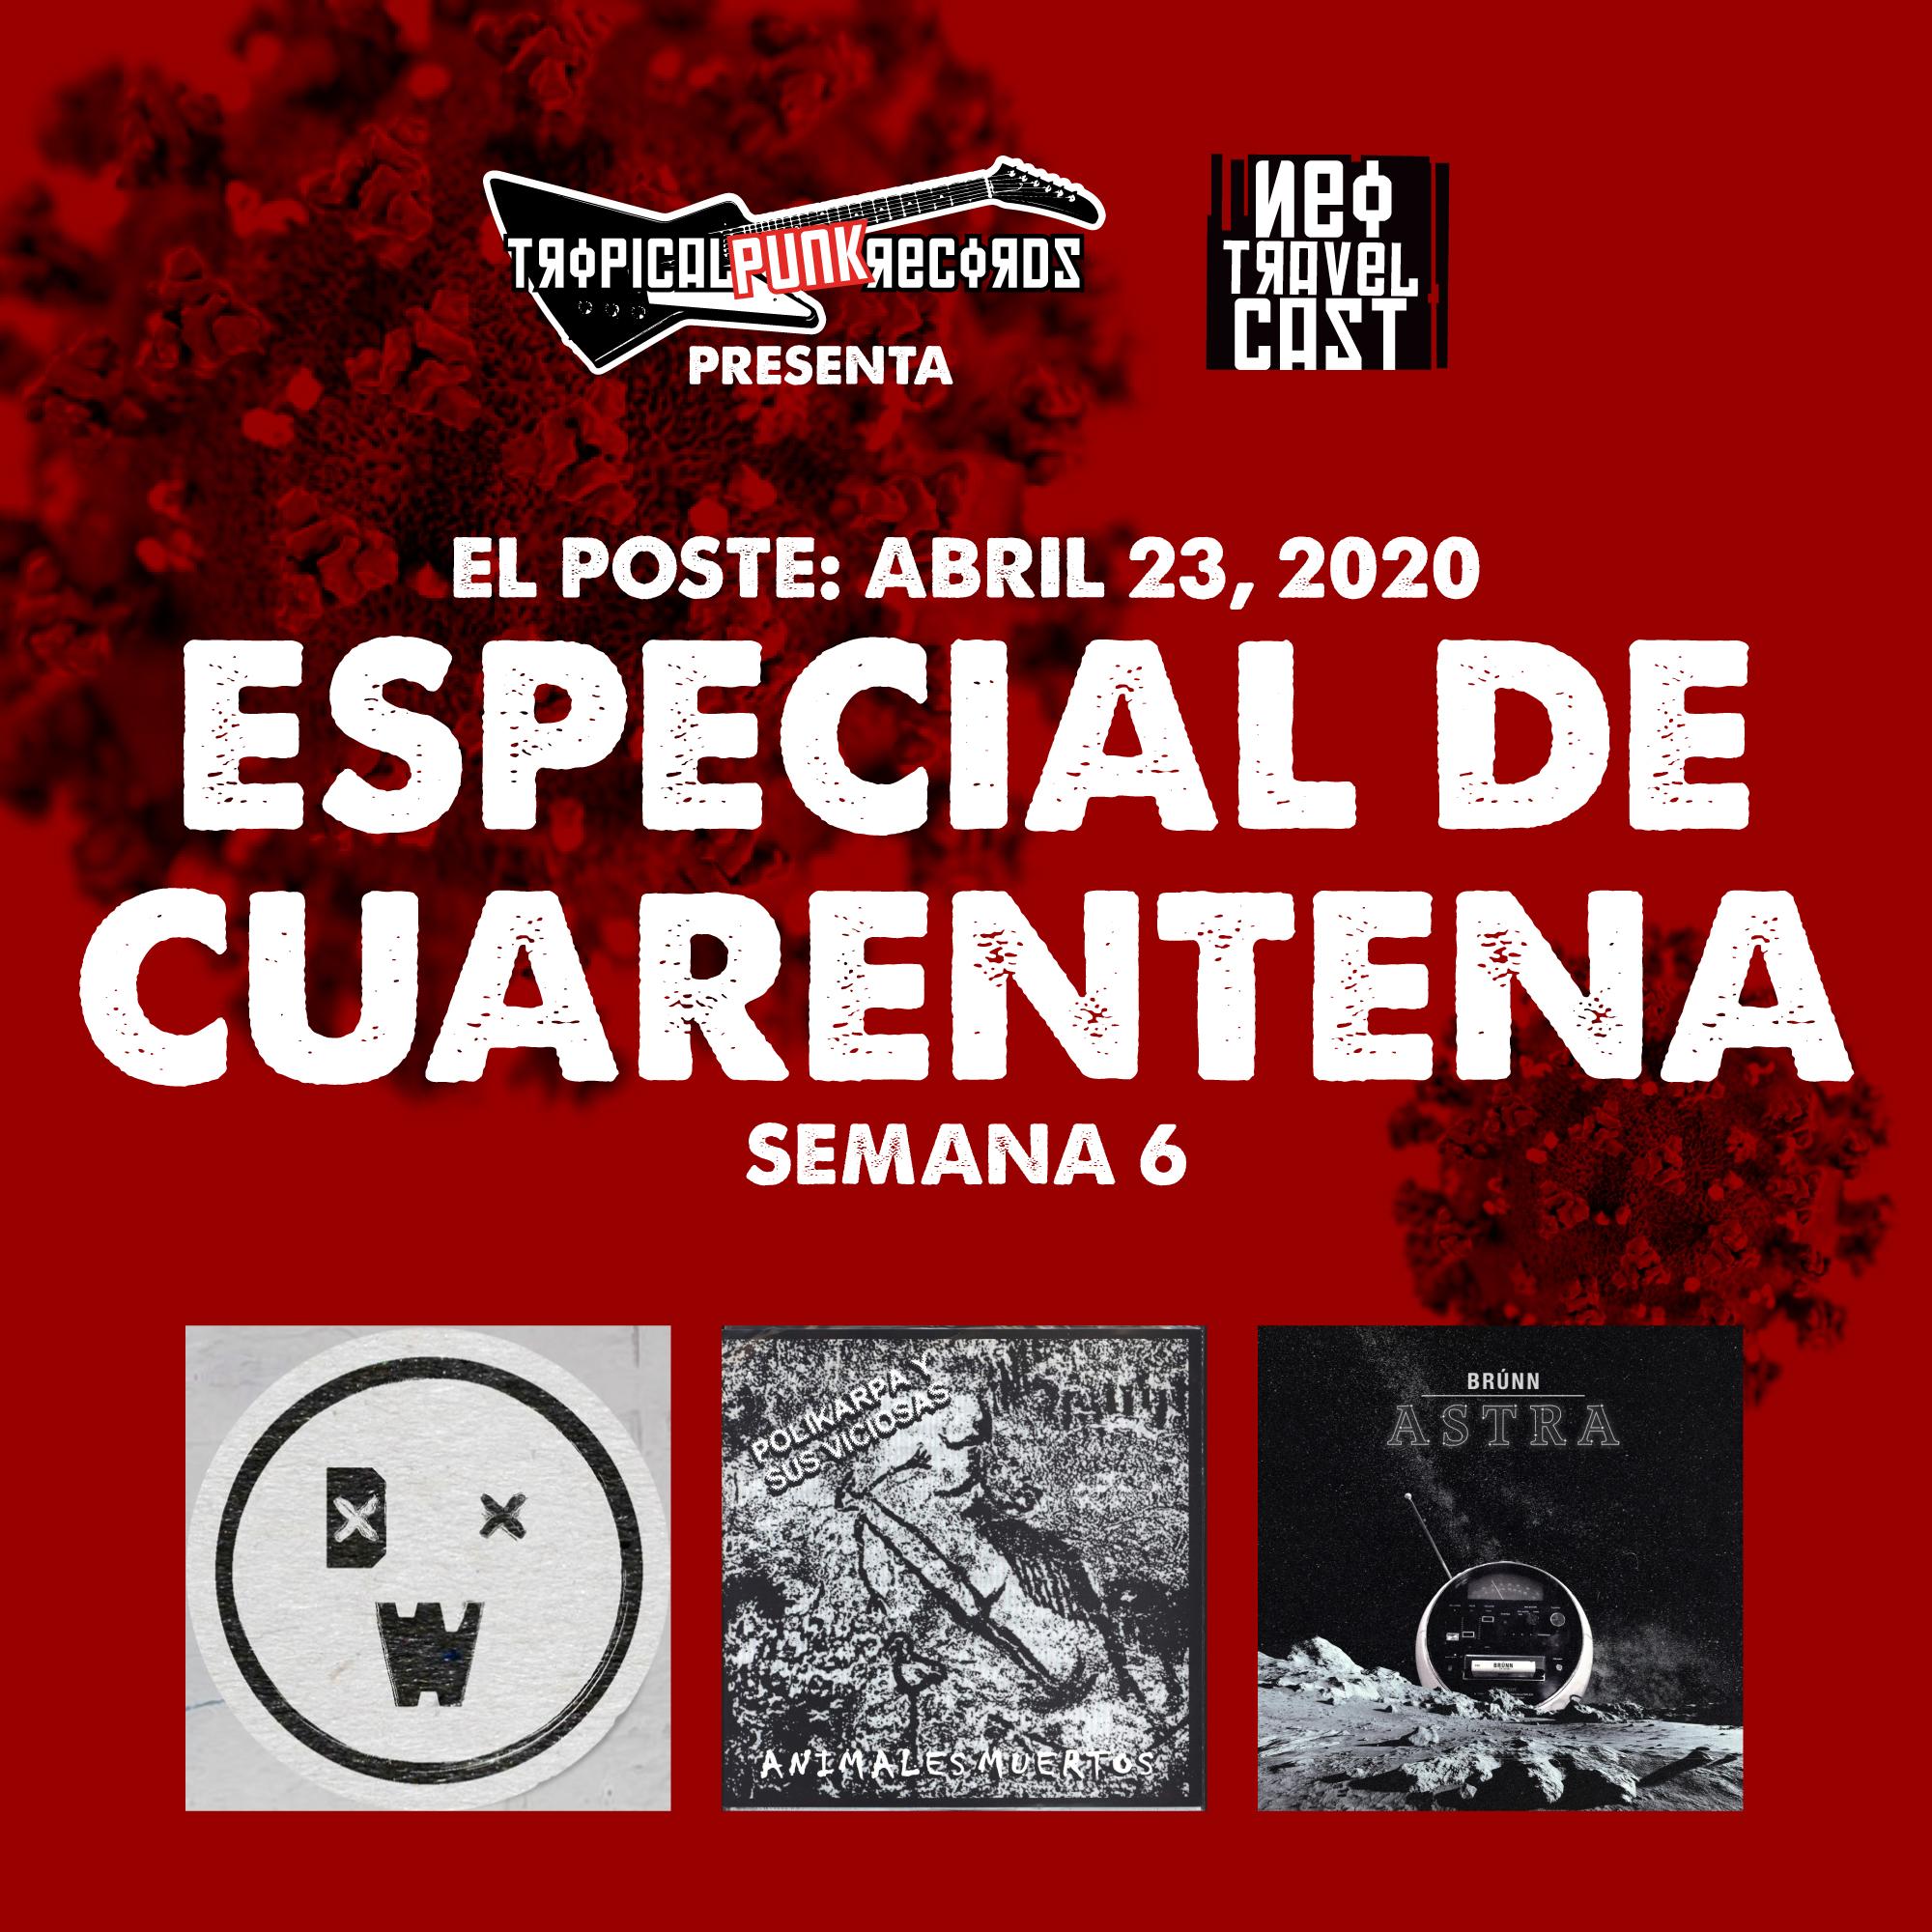 Tropical Punk Records presenta el Neo Travel Cast podcast El Poste (Episodio 10)